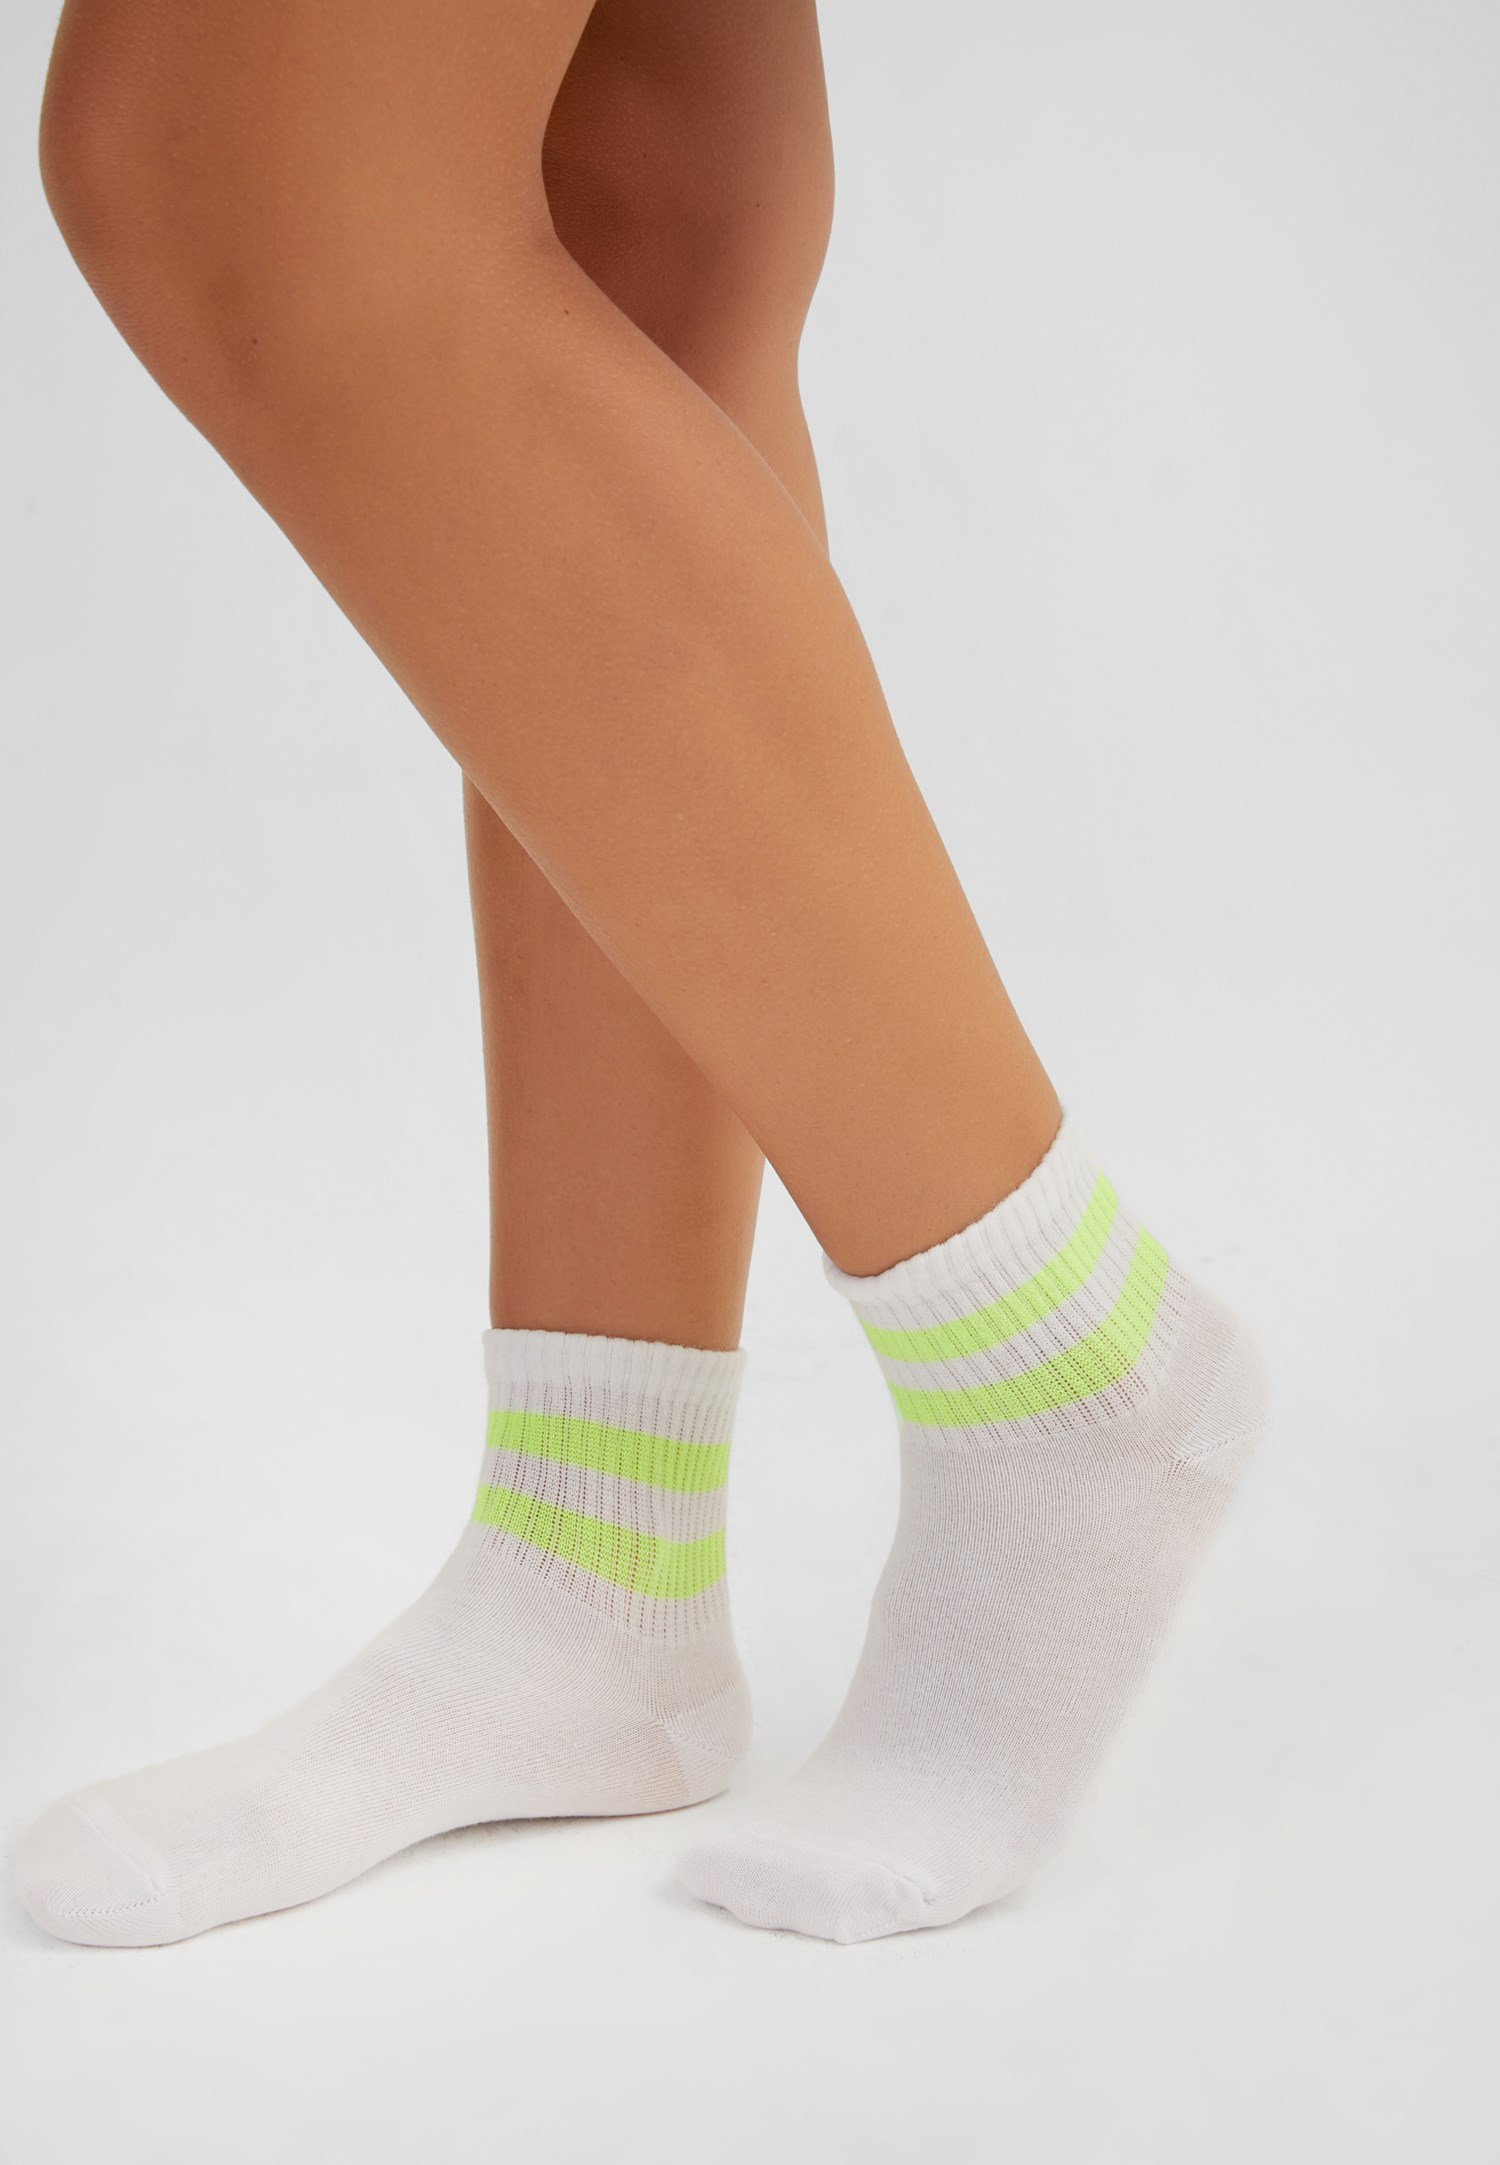 Bayan Sarı Çizgili Çorap